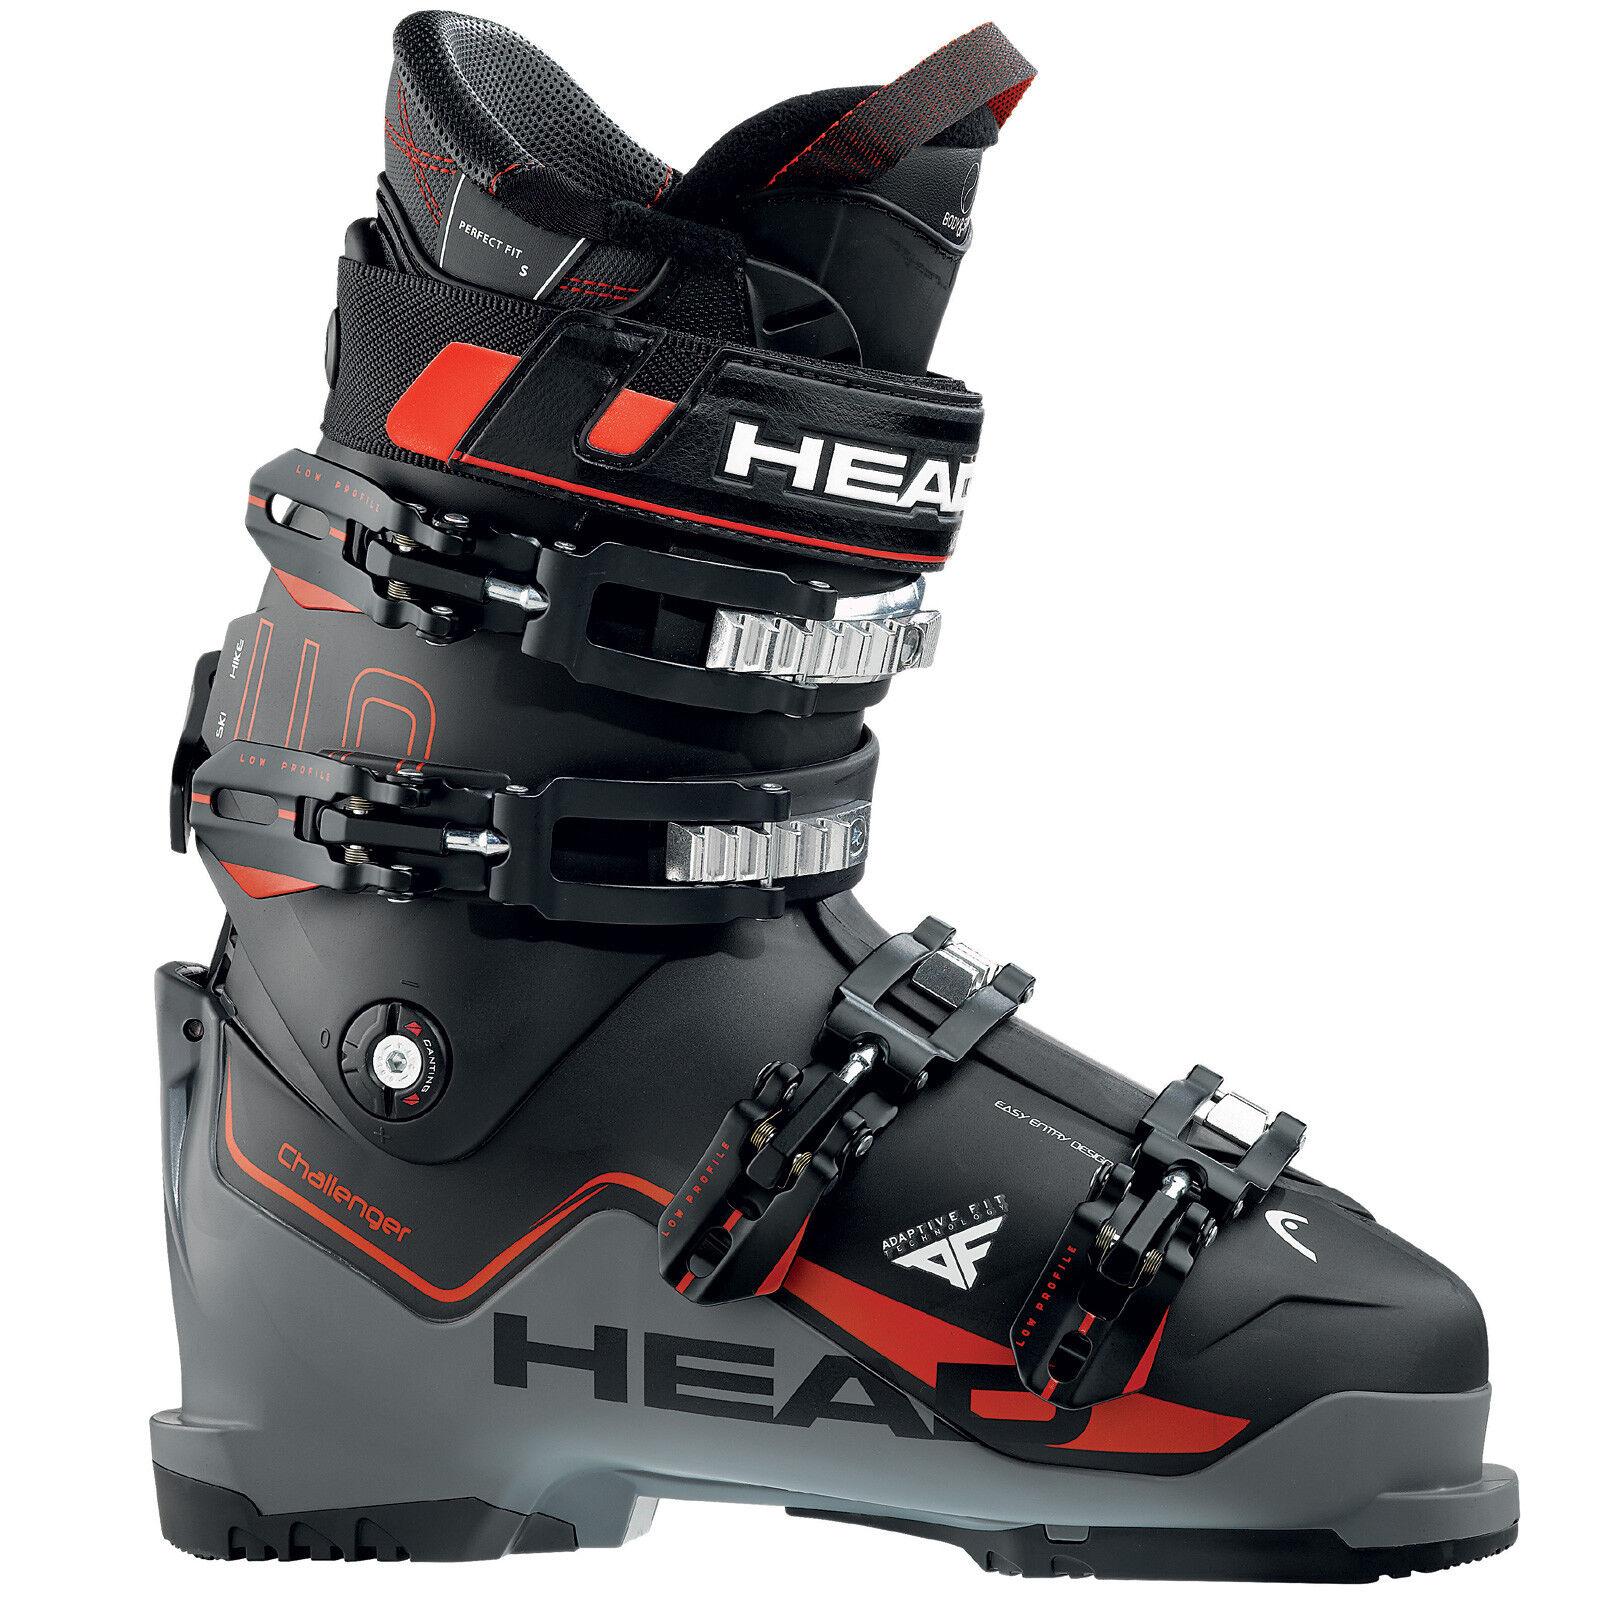 Head Challenger 110 Herren-Skistiefel Herren-Skistiefel Herren-Skistiefel Skischuhe 4-Schnallen Pisten-Schuhe NEU 36ccdd